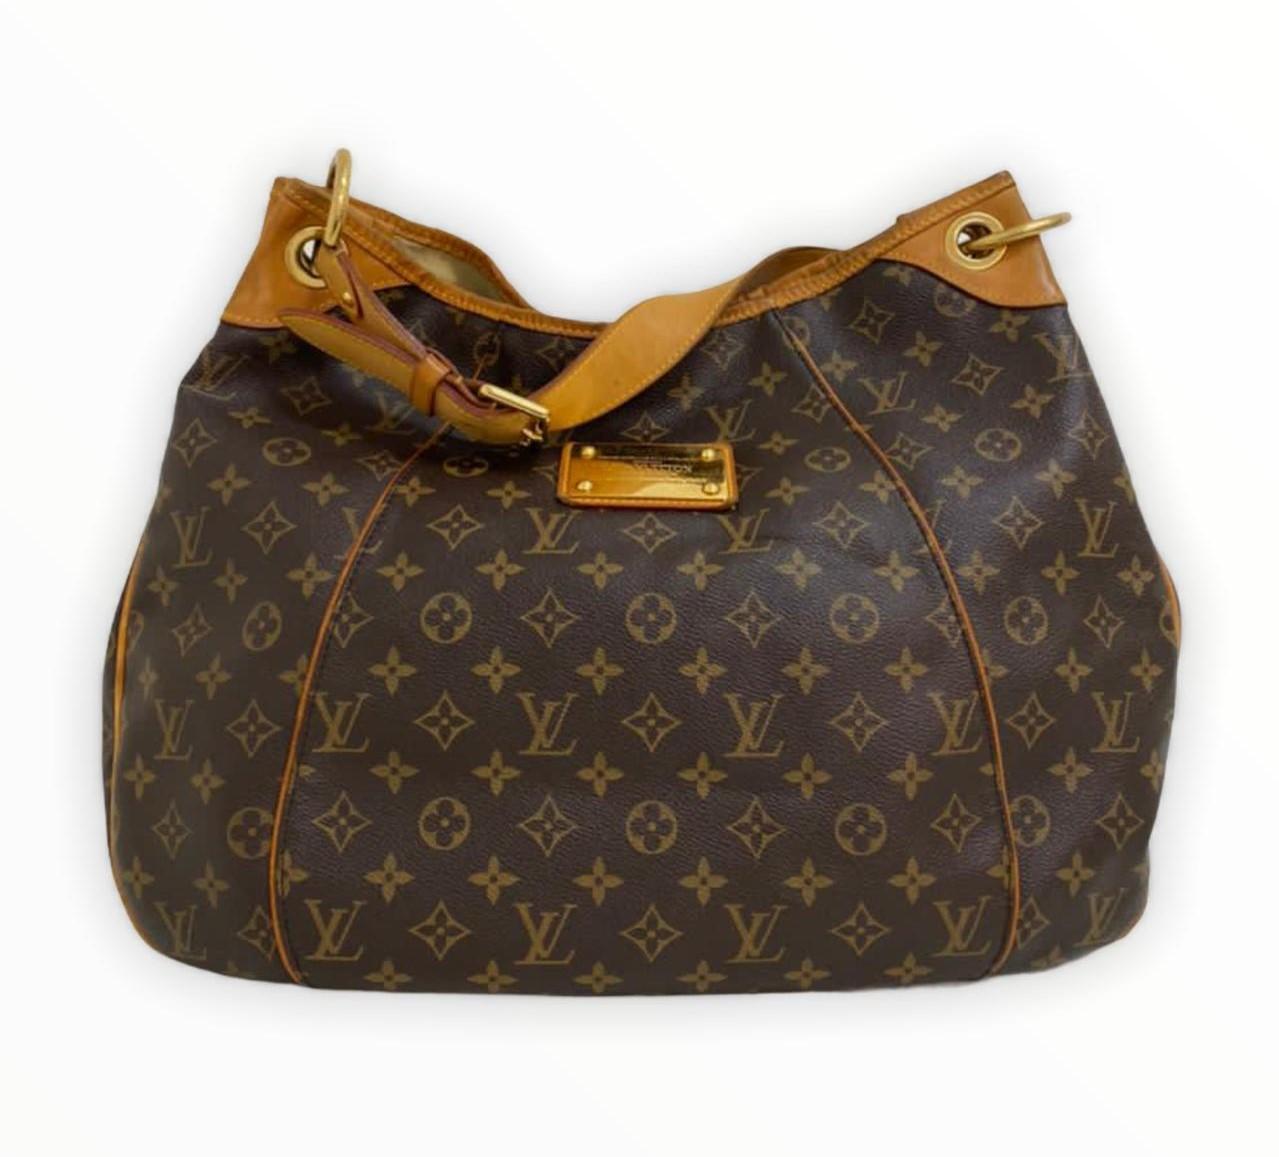 Bolsa Louis Vuitton Galliera MM Monogram